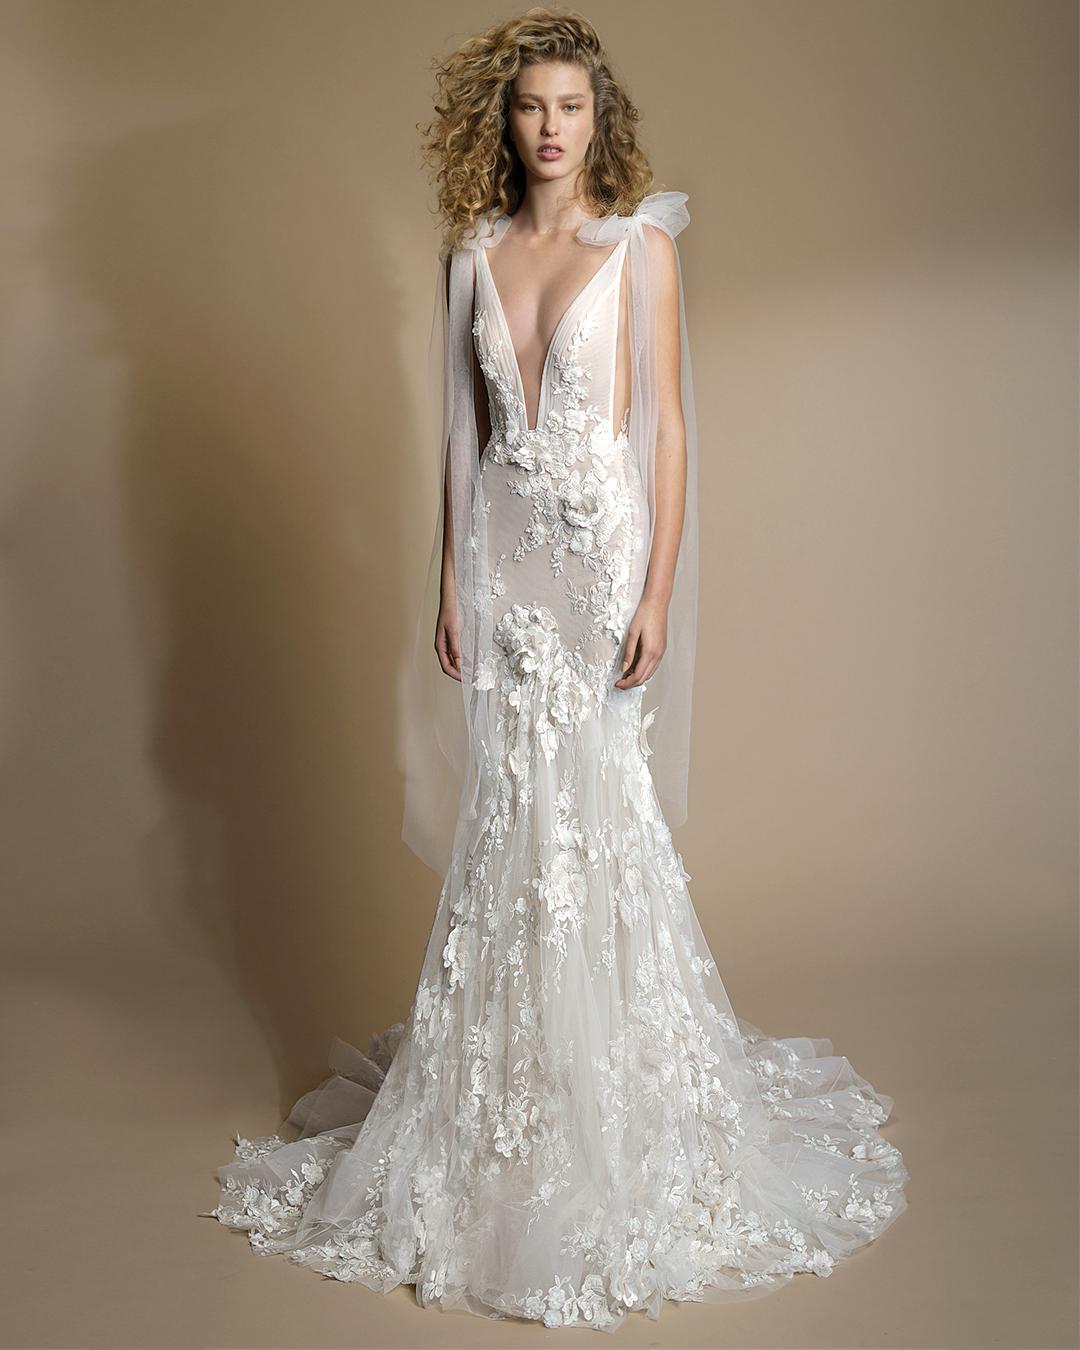 galia lahav gala wedding dress spring 2019 lace v-neck mermaid